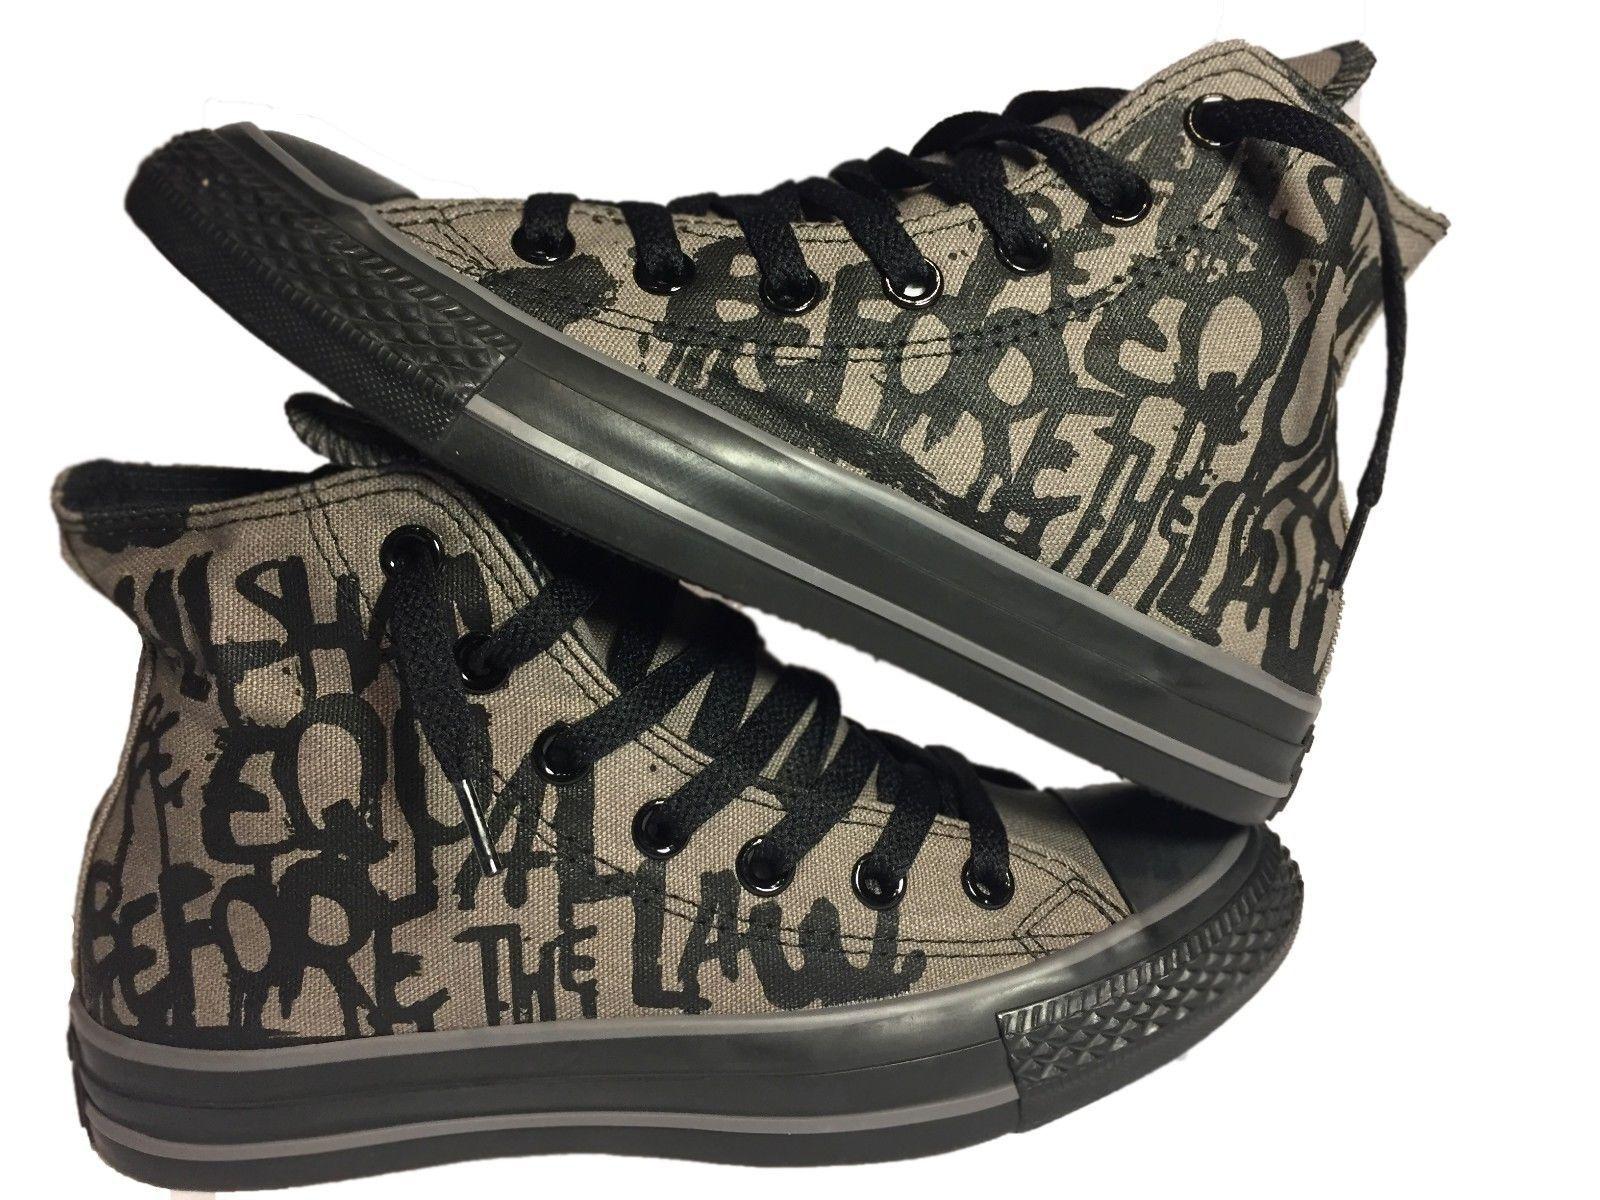 Chuck Taylor All Star Converse Fashion CT Hi top Charcoal Grey 139748F